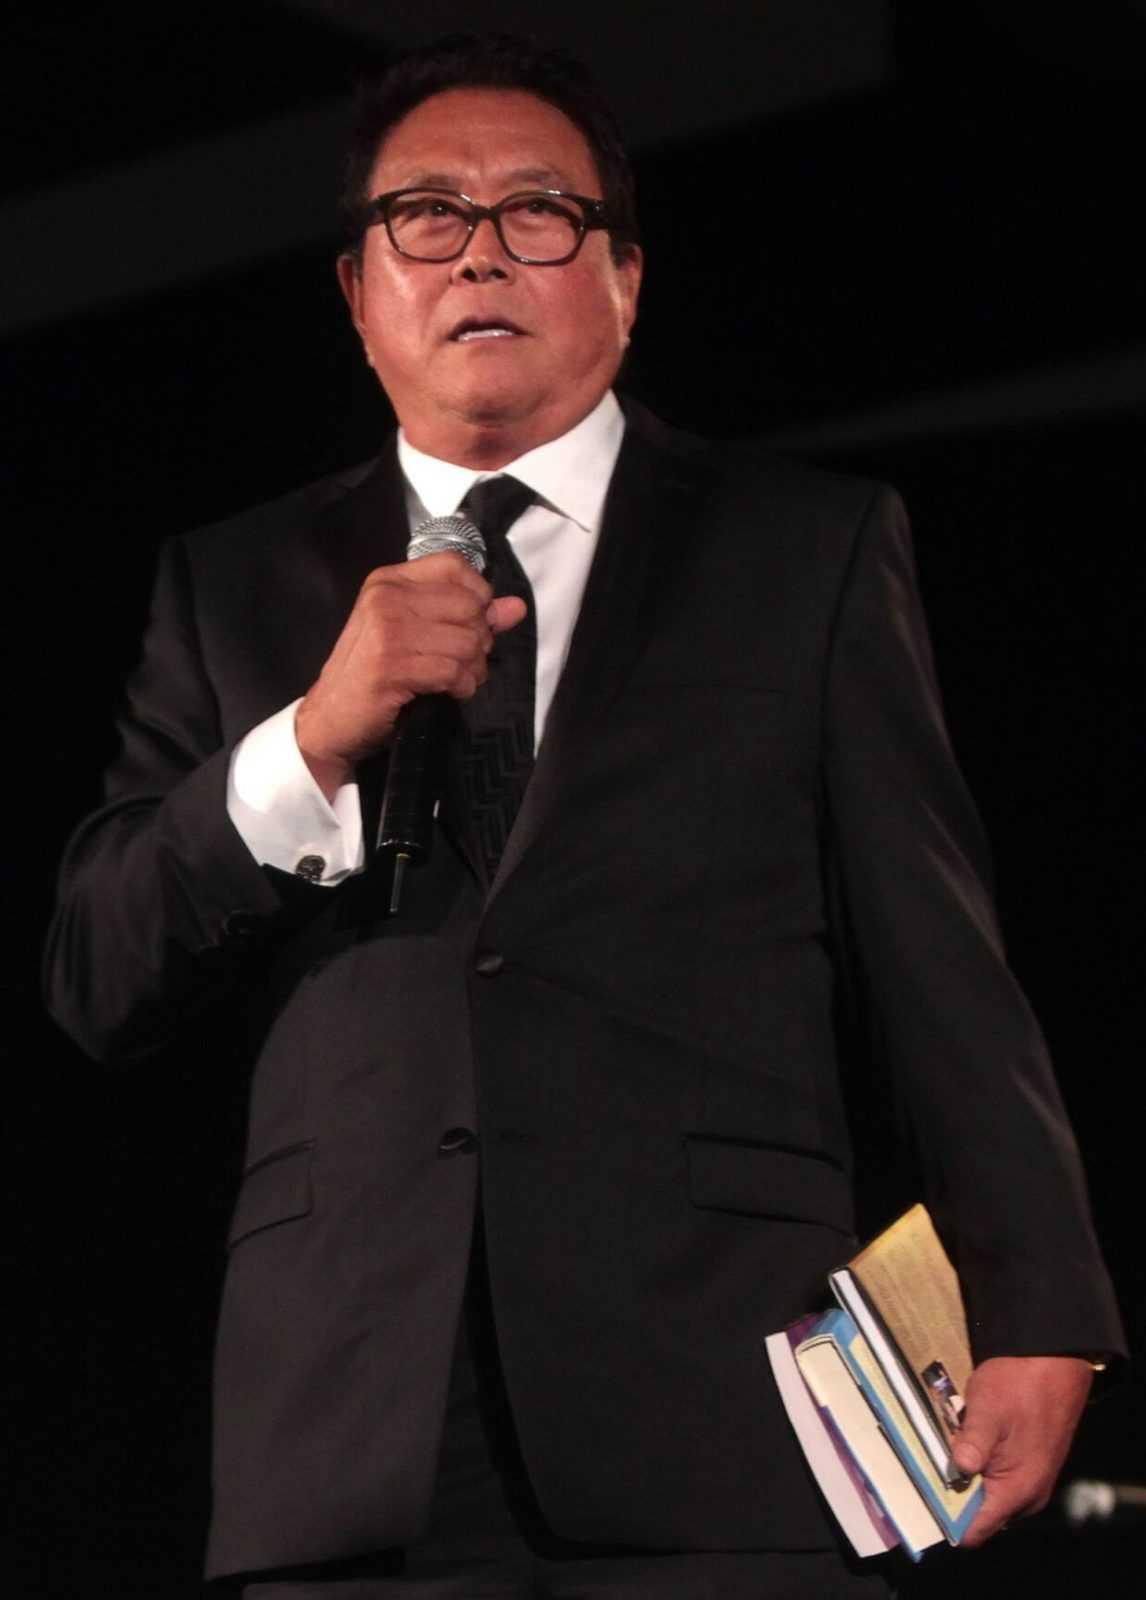 Roberts Kijosaki